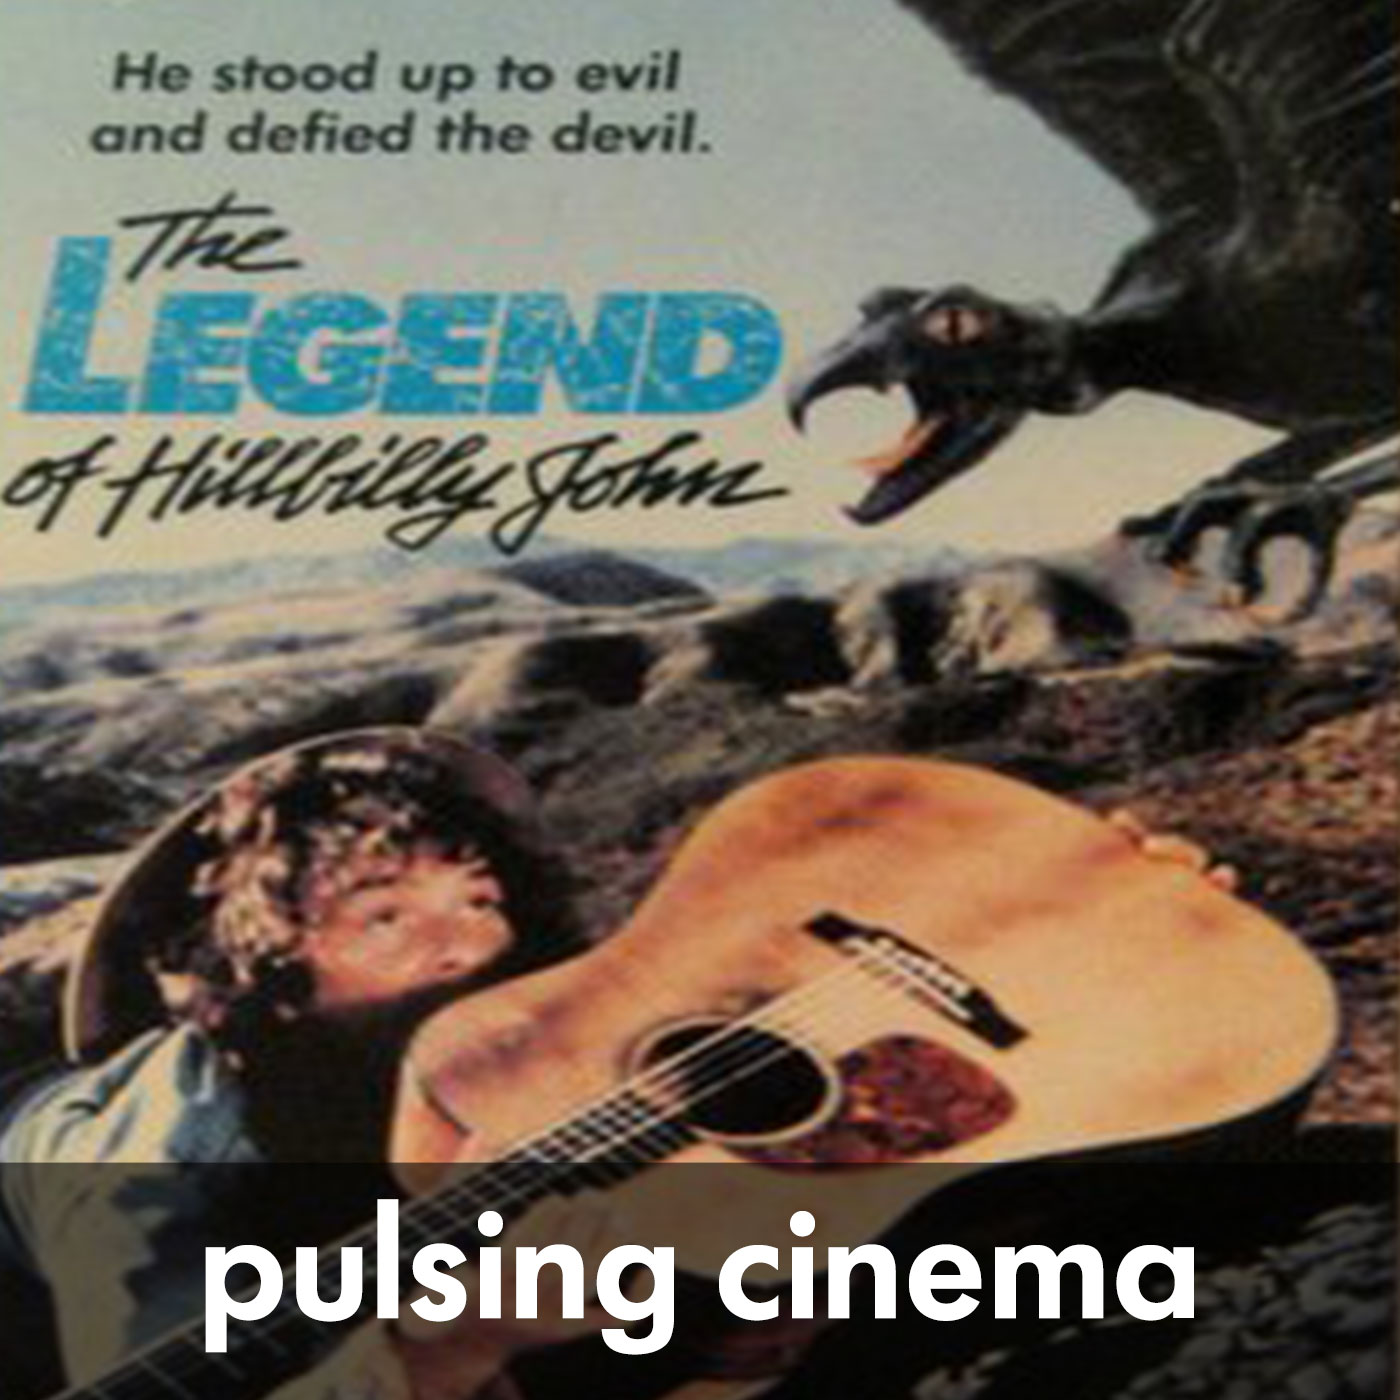 Movie of the Week: The Legend of Hillbilly John (1972)